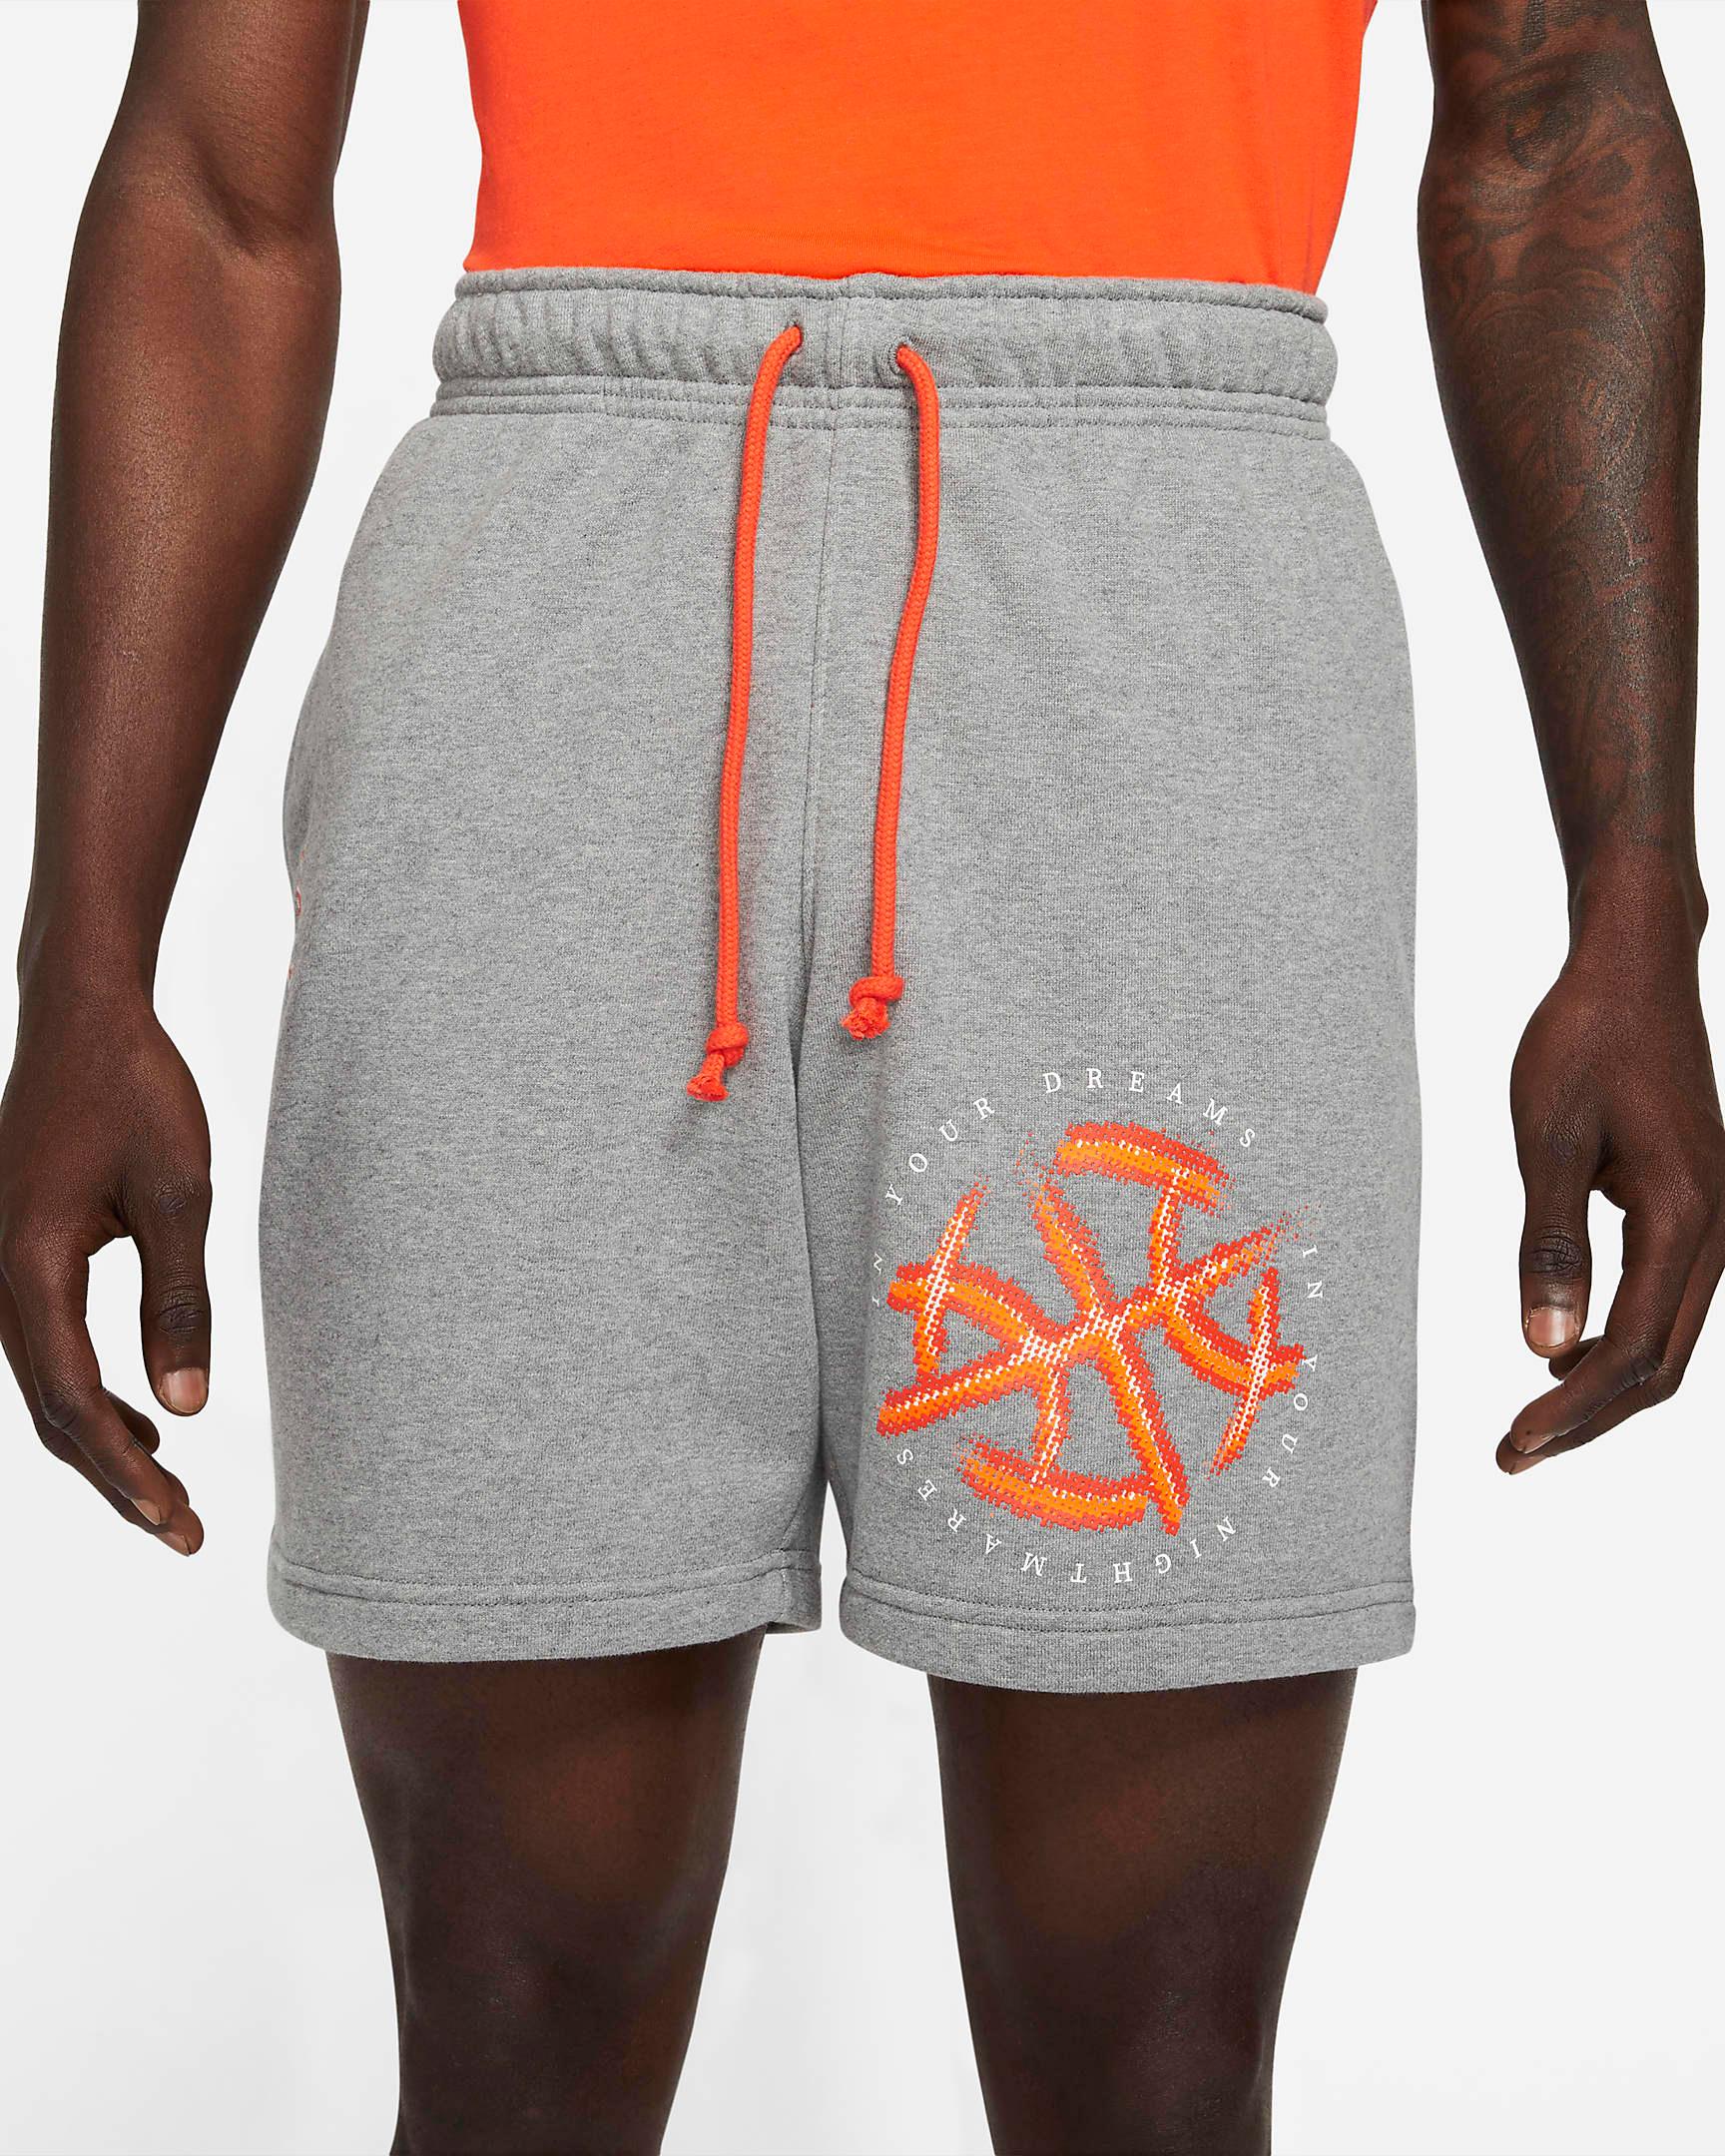 jordan-orange-grey-sport-dna-shorts-2